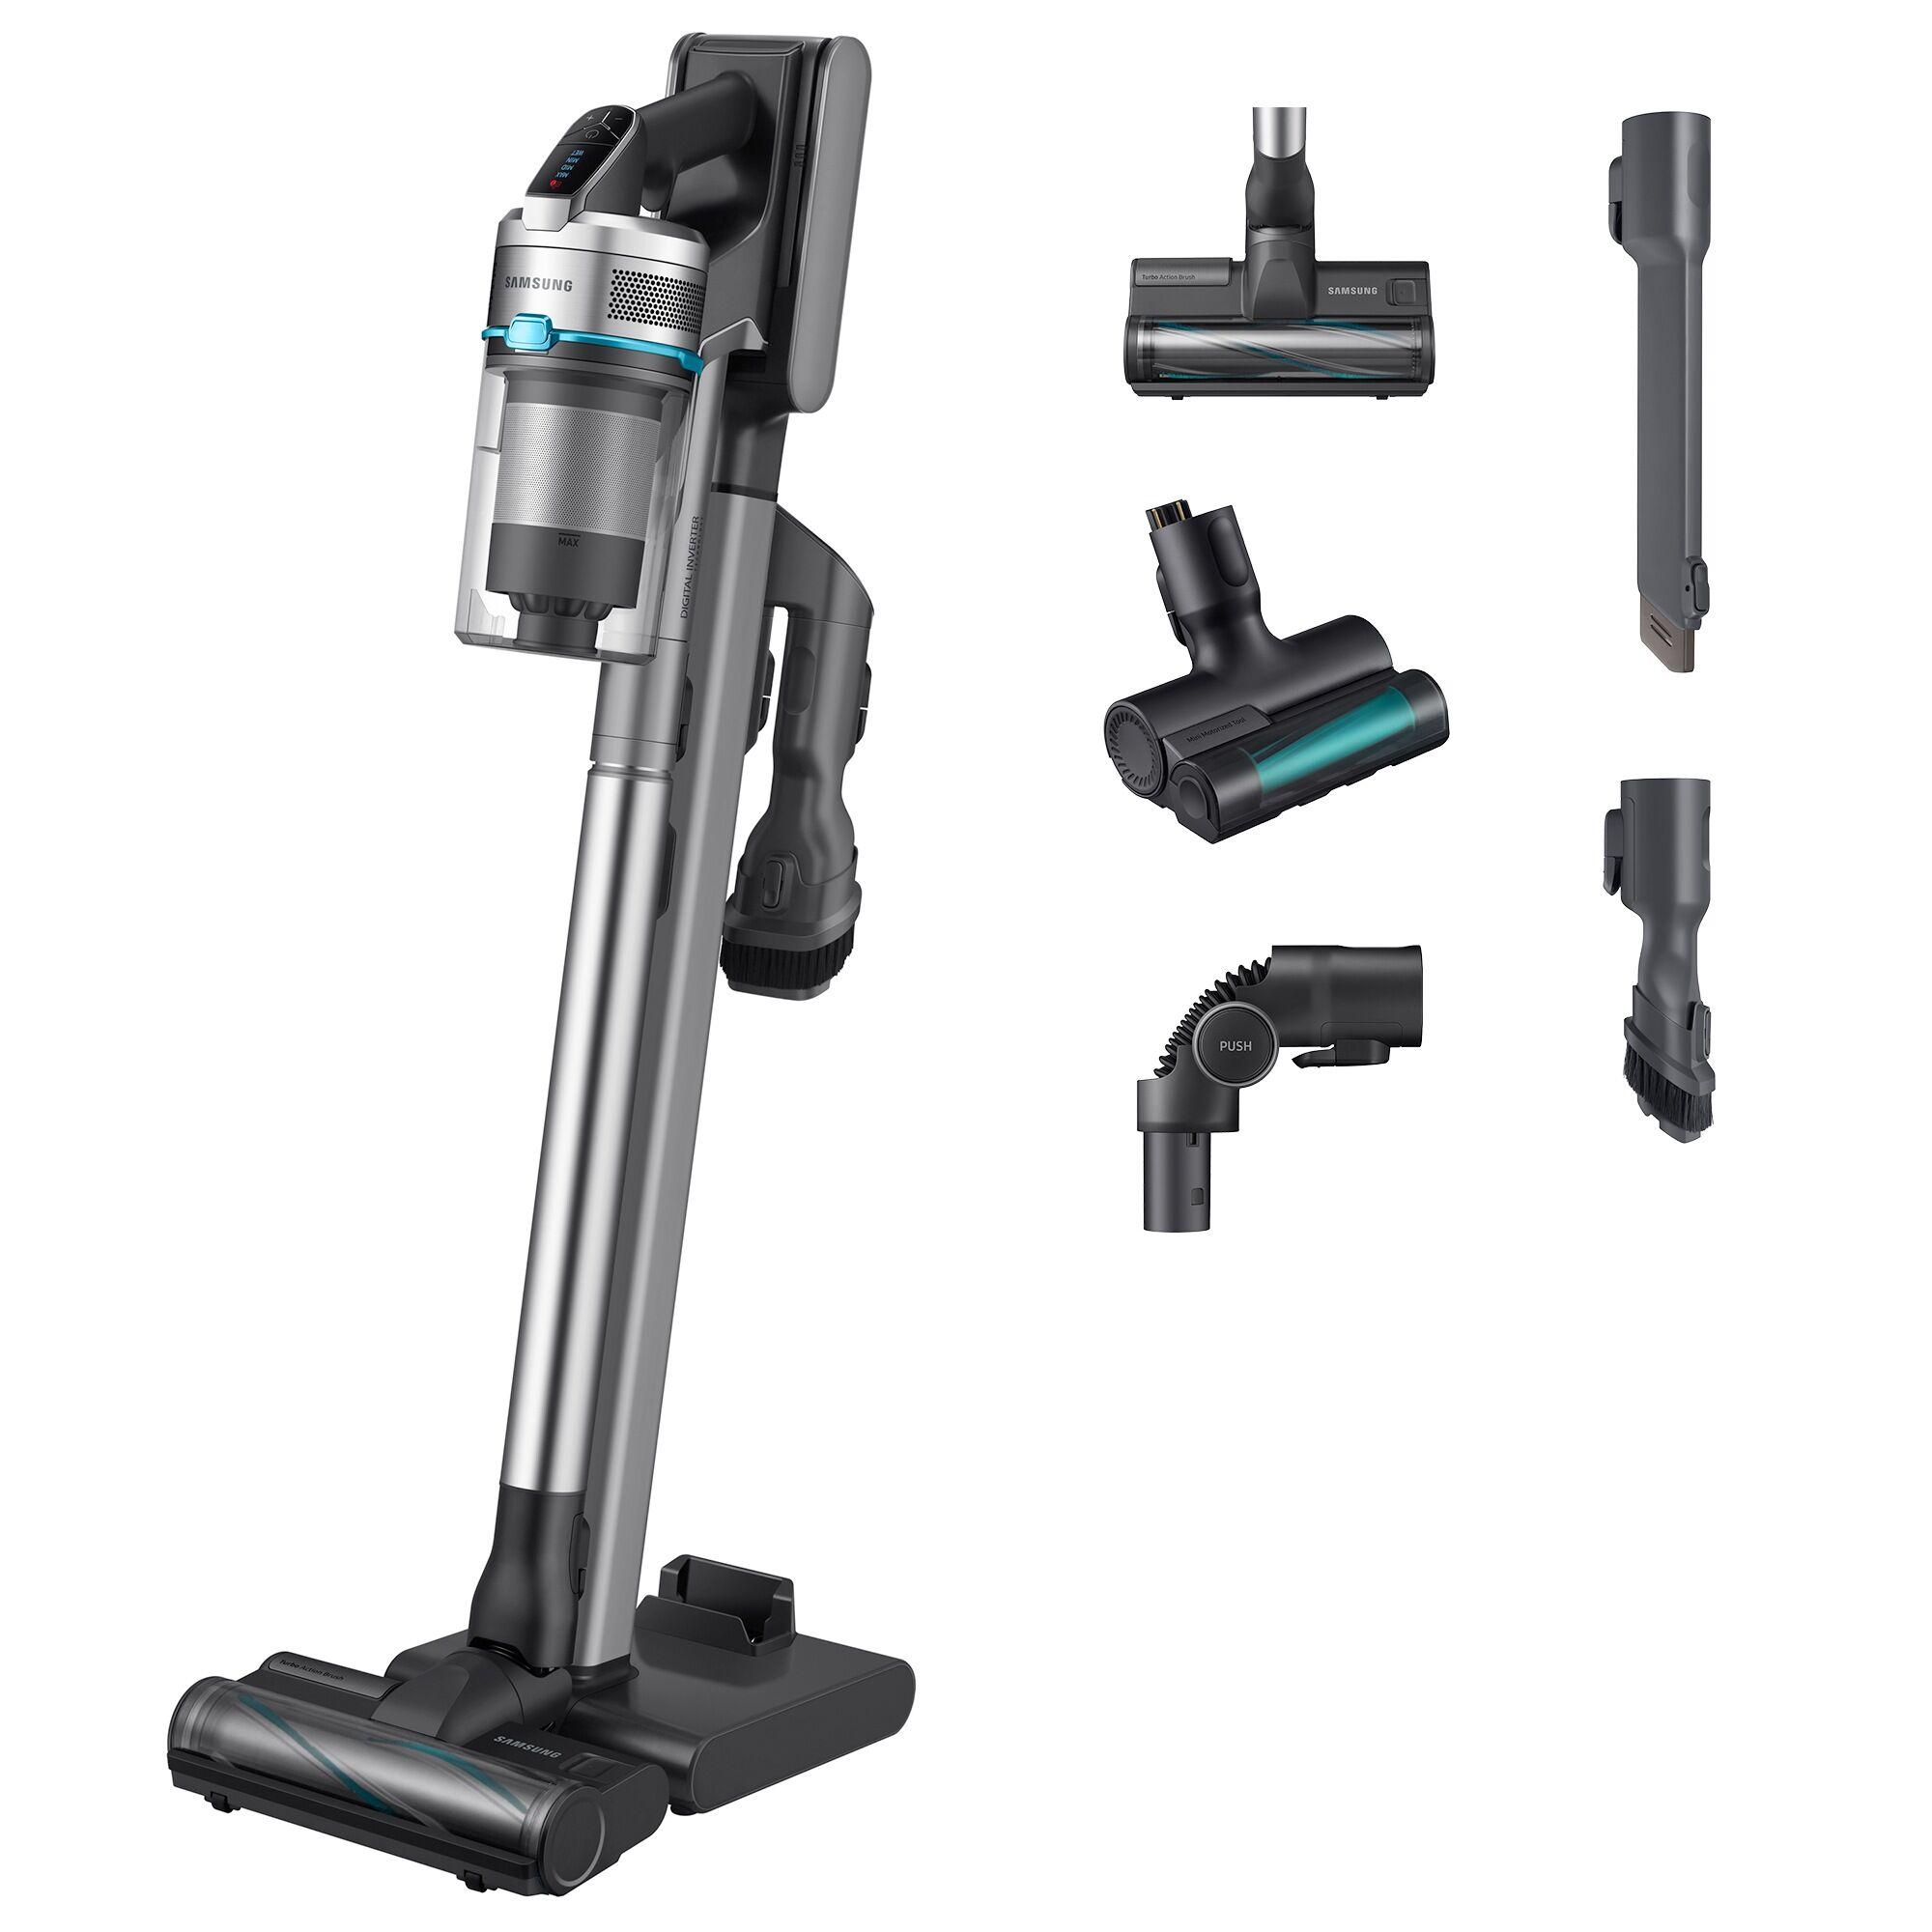 Samsung POWERstick Jet™ Vacuum Cleaner Silver (VS20R9042S2/EU)